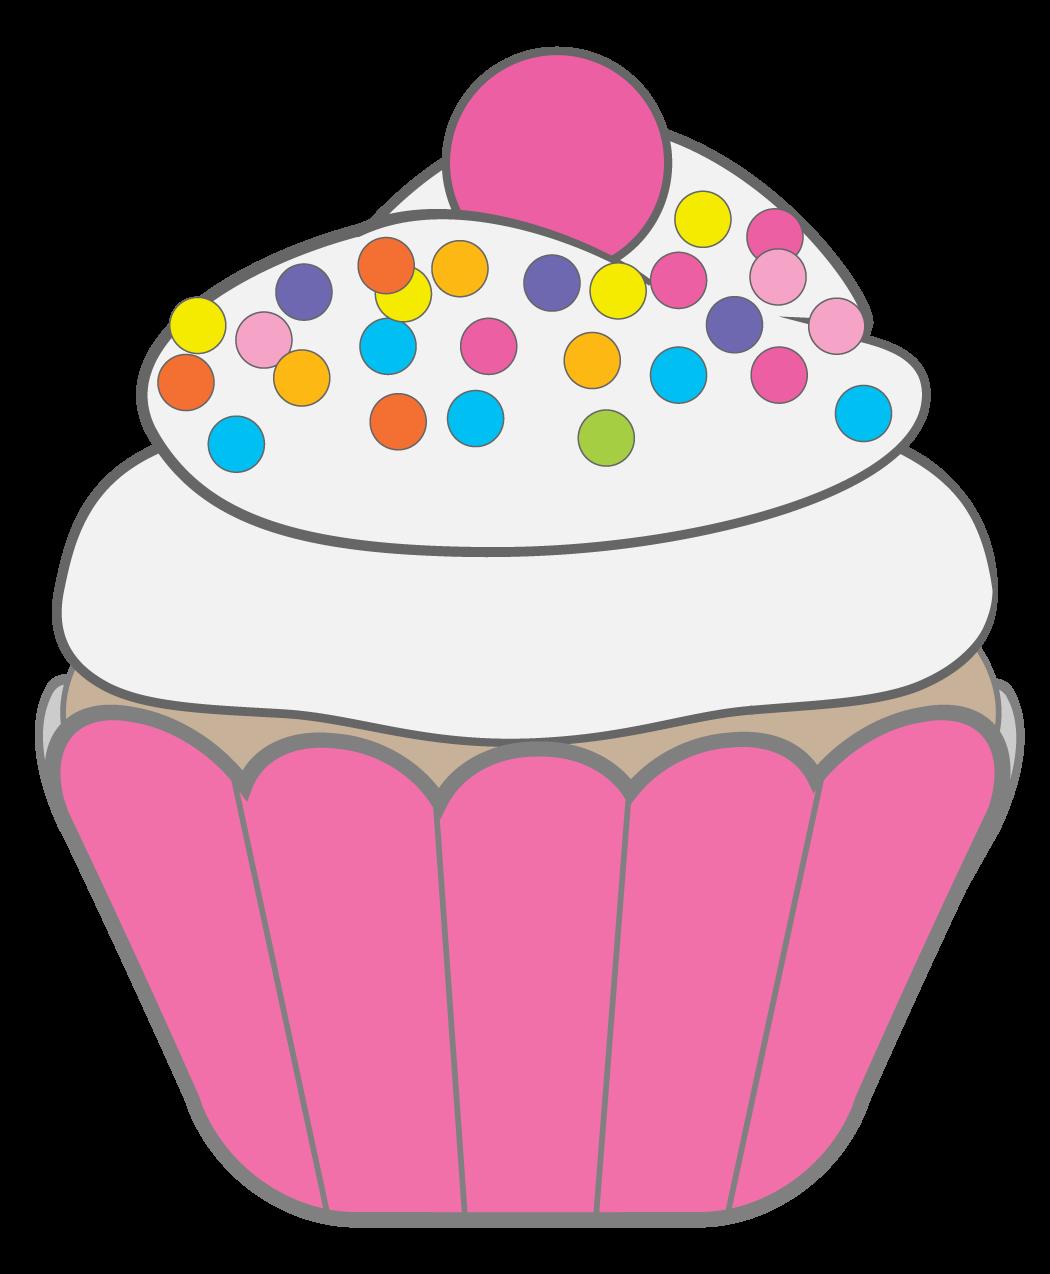 Icing clipart plain cupcake 20clipart Muffin Free Panda Clipart